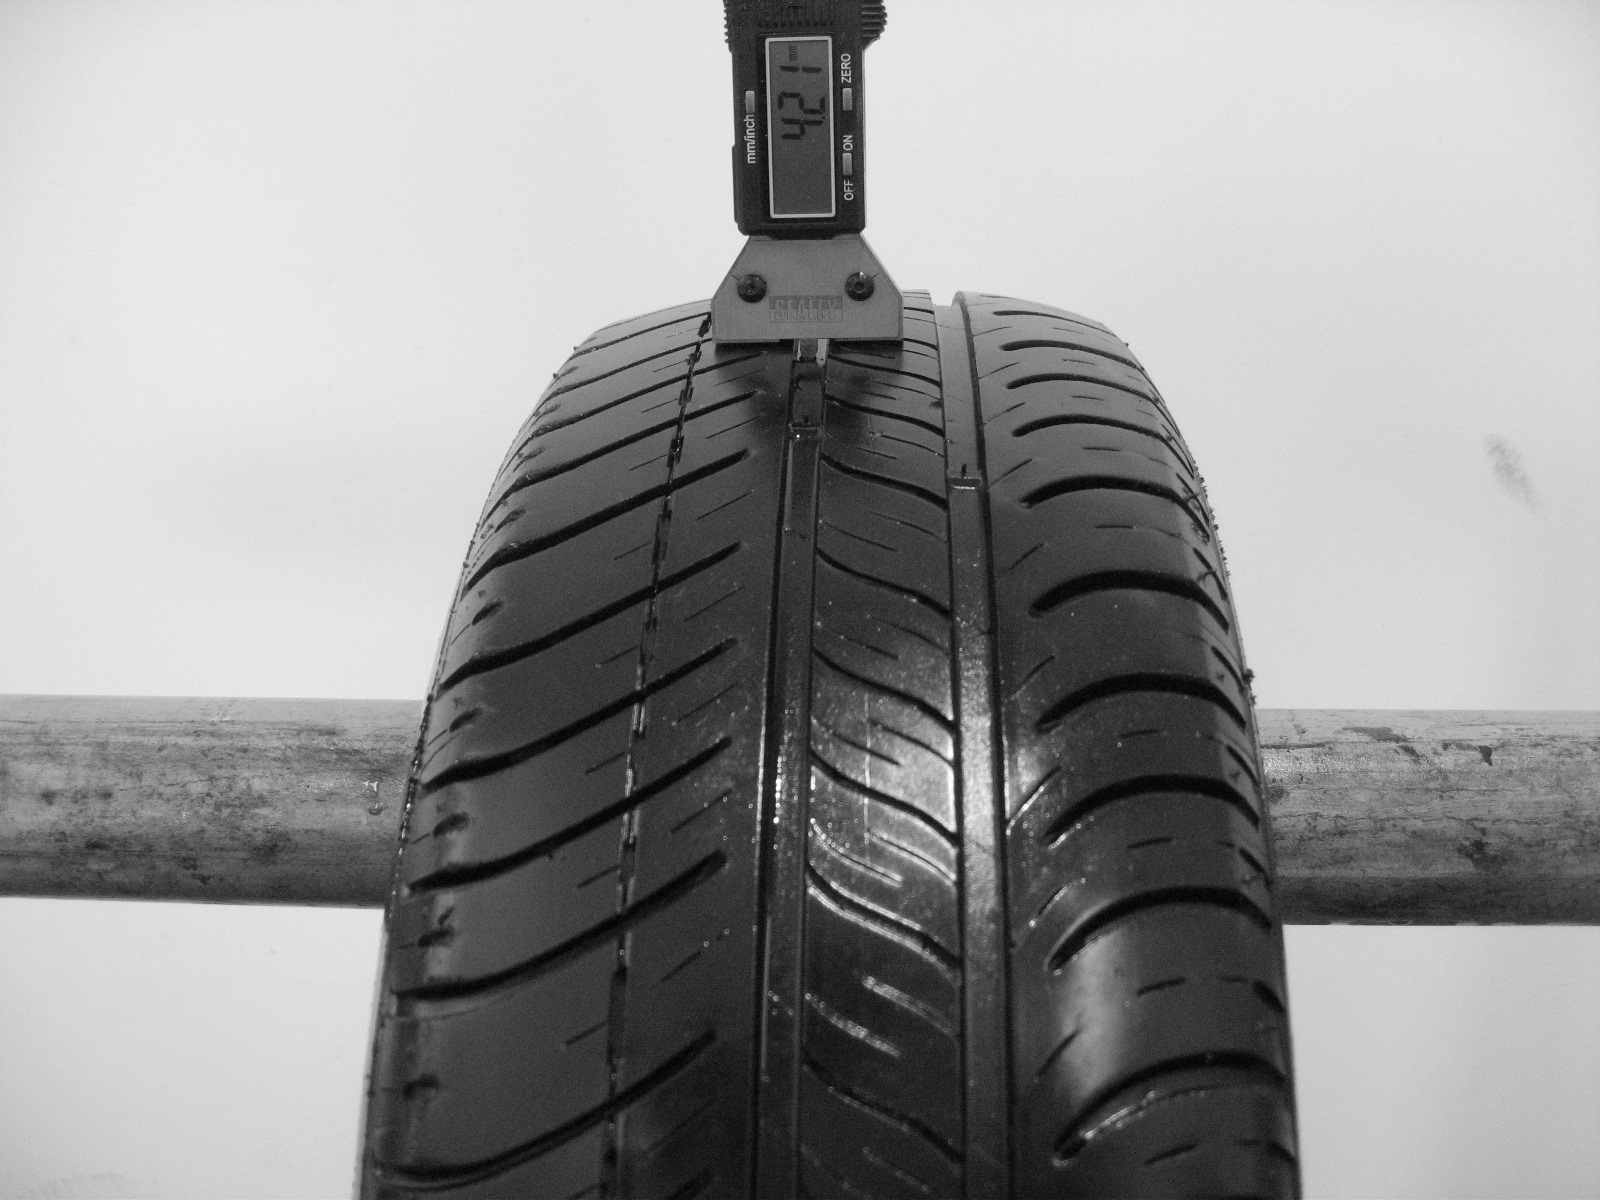 Použité-Pneu-Bazar - 175/65 R14 MICHELIN ENERGY E3A -kusovka-rezerva 4mm